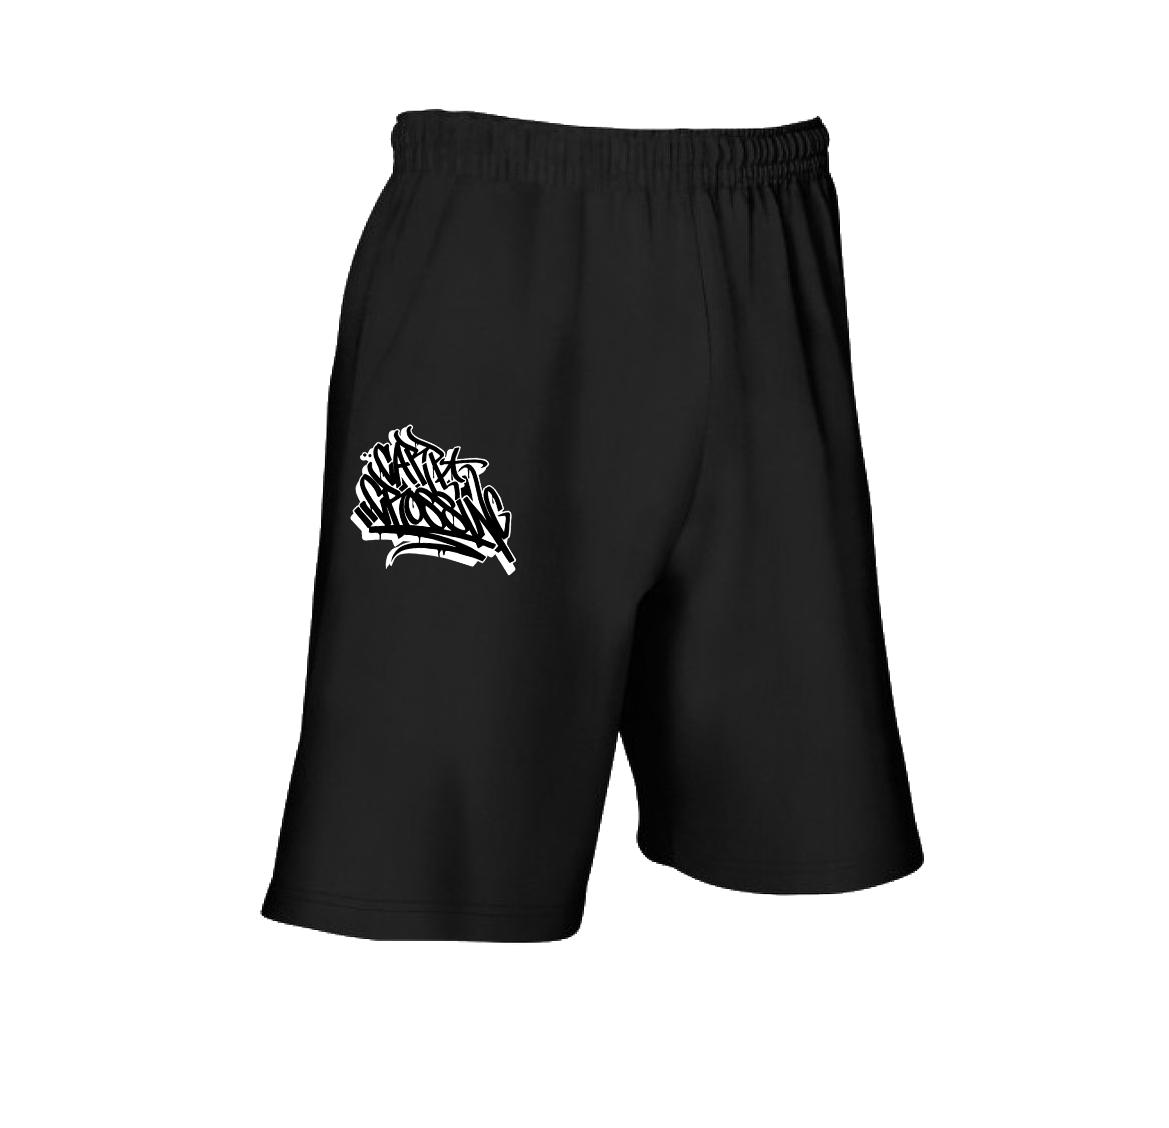 Carpcrossing Urban Short Pants Black